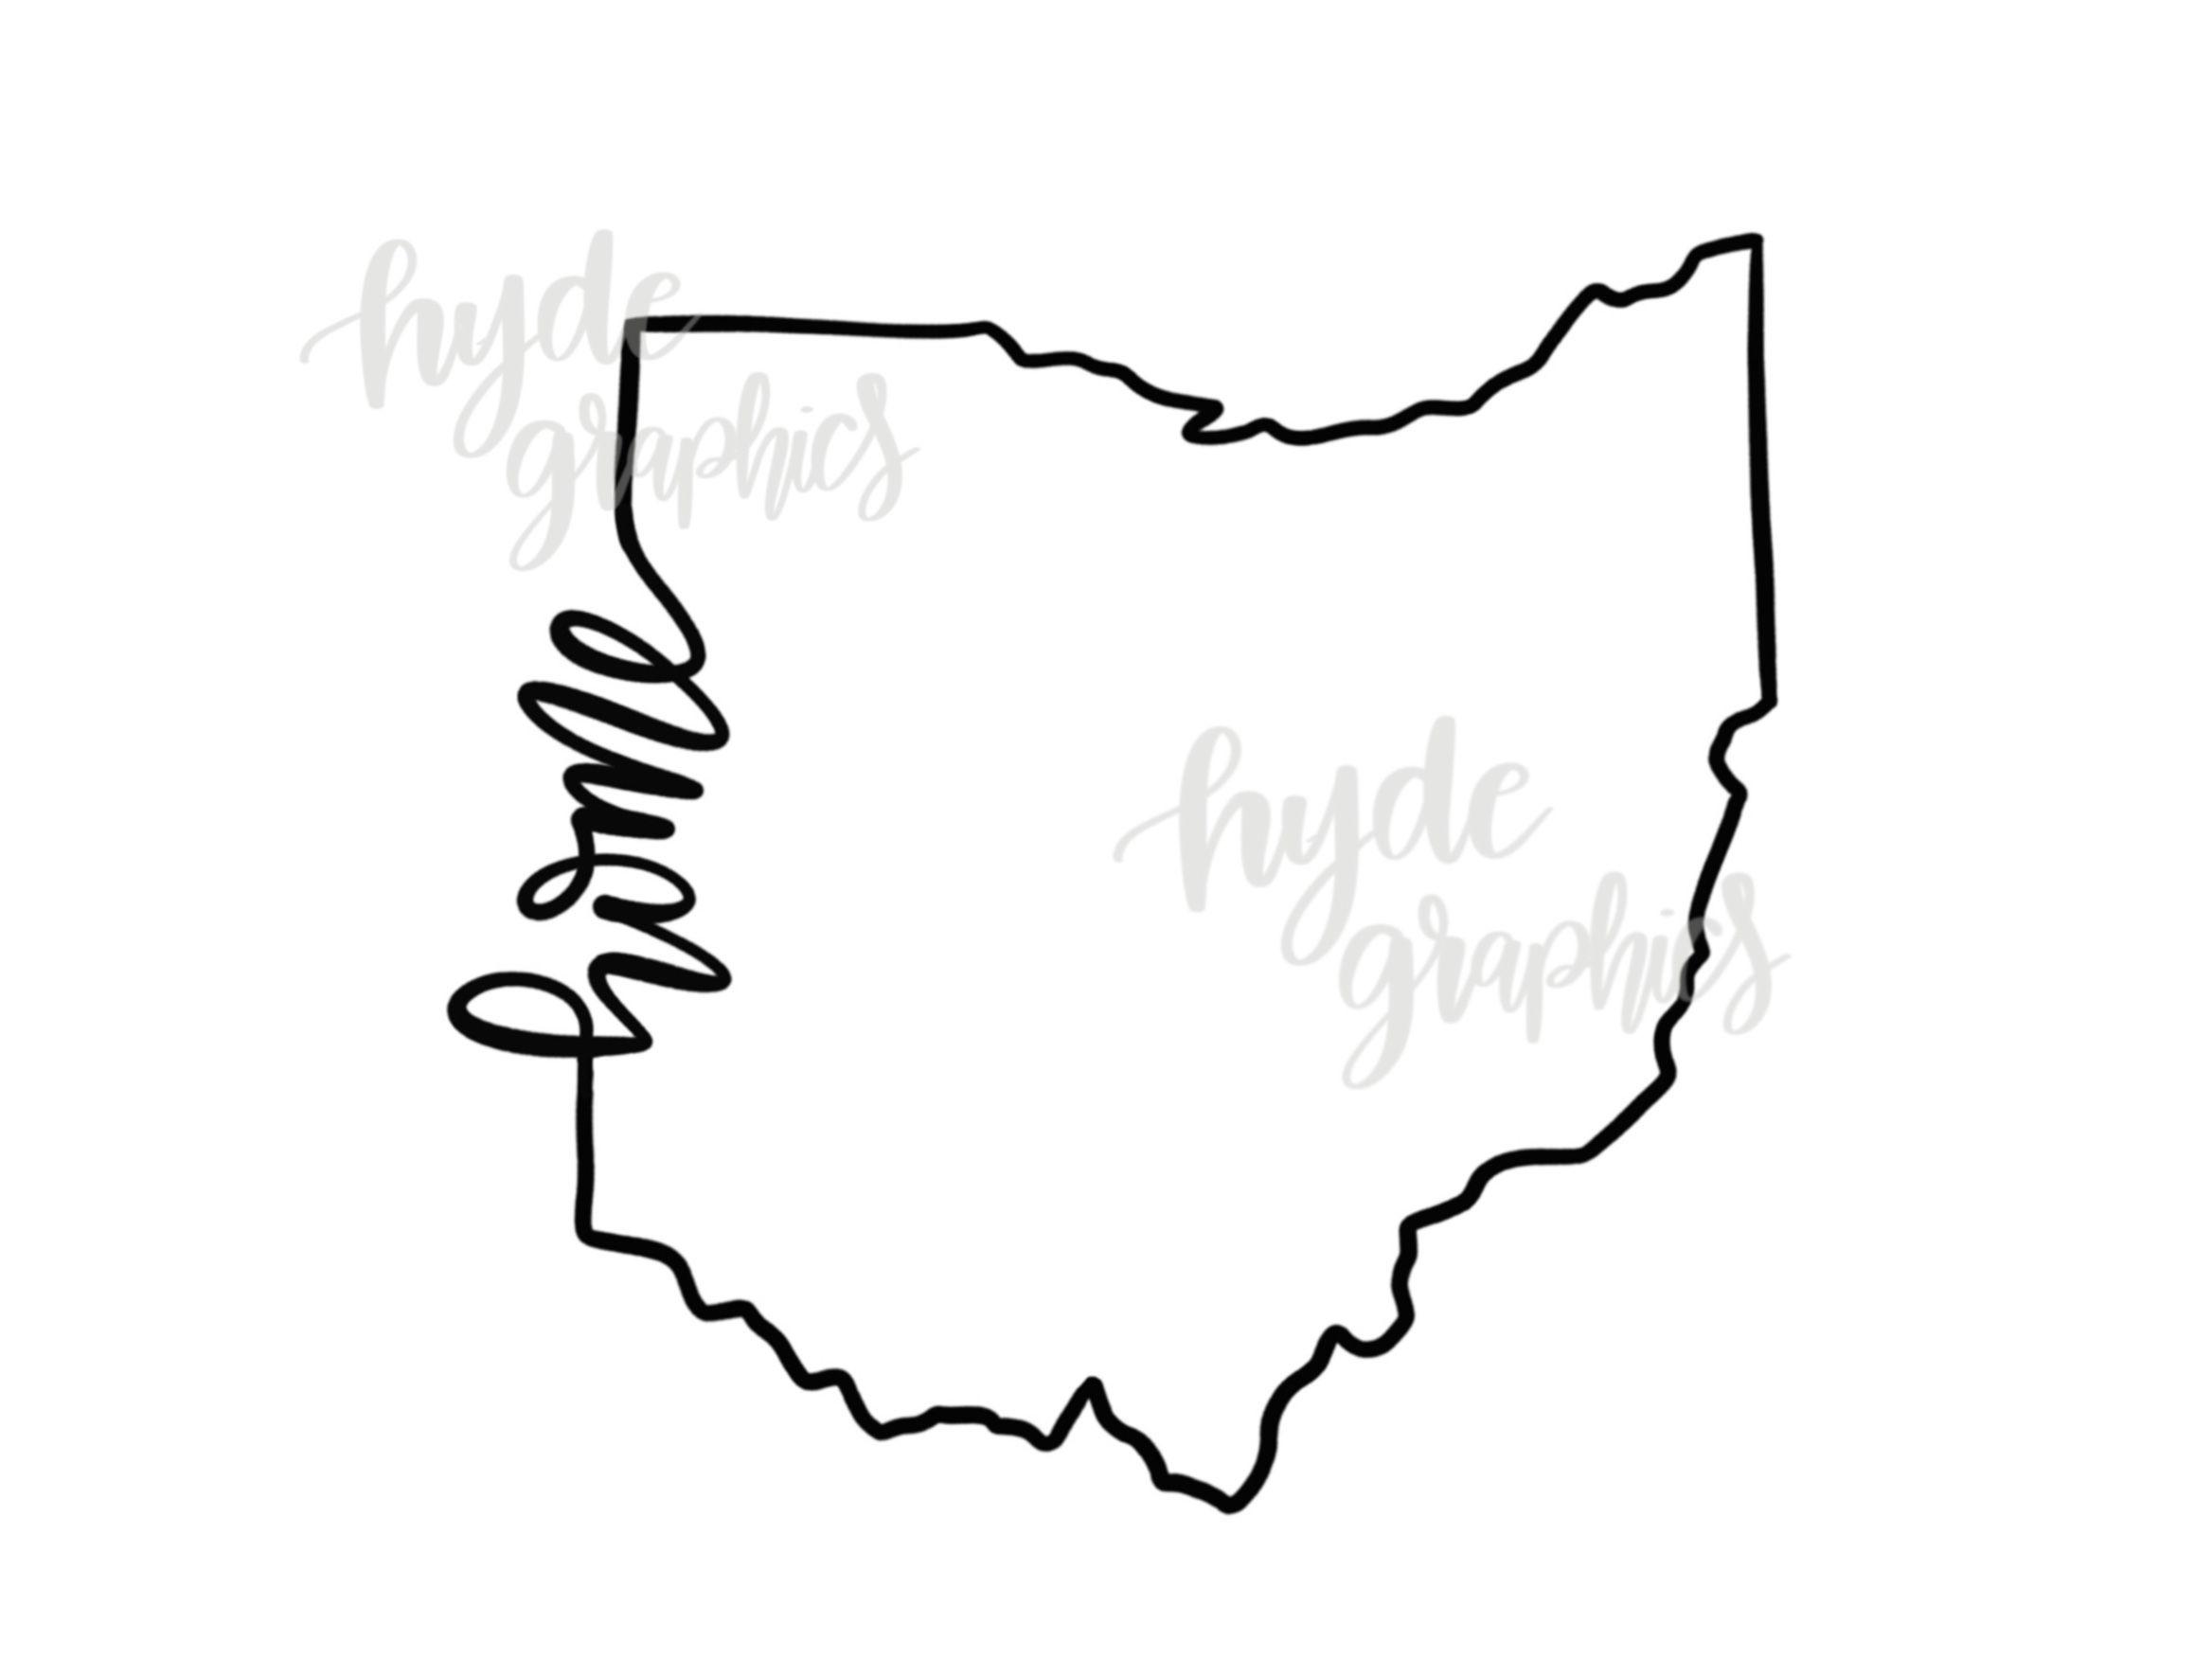 Ohio Home Outline Svg File Ohio Outline Svg Design Ohio Svg Vinyl Designs Png File Ohio Outline Svg Ohio